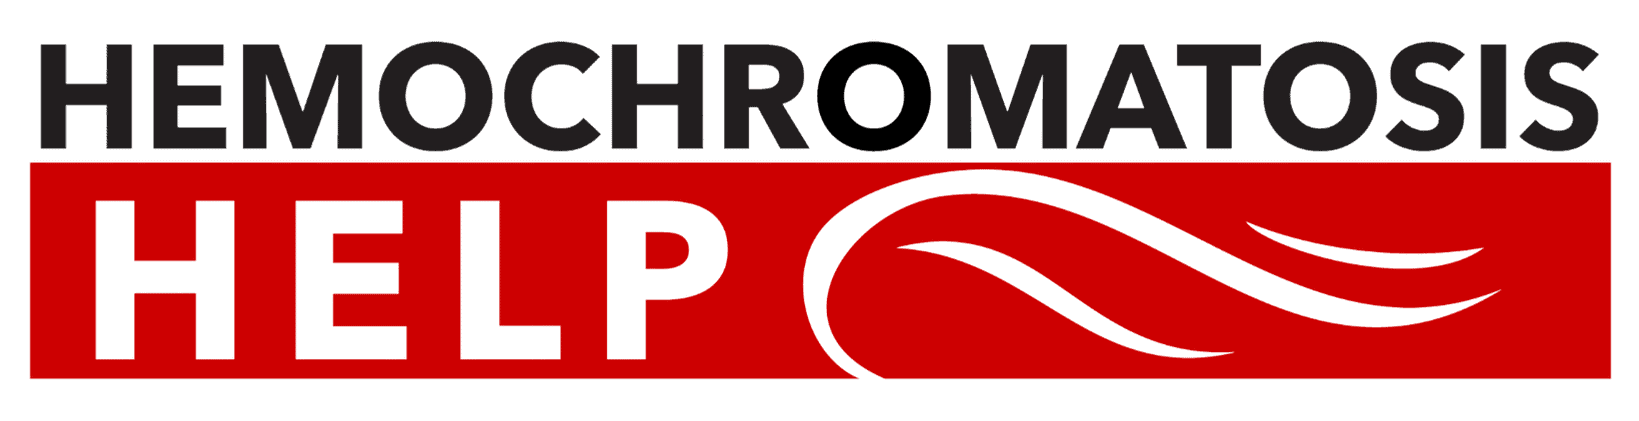 HemochromatosisHelp.com